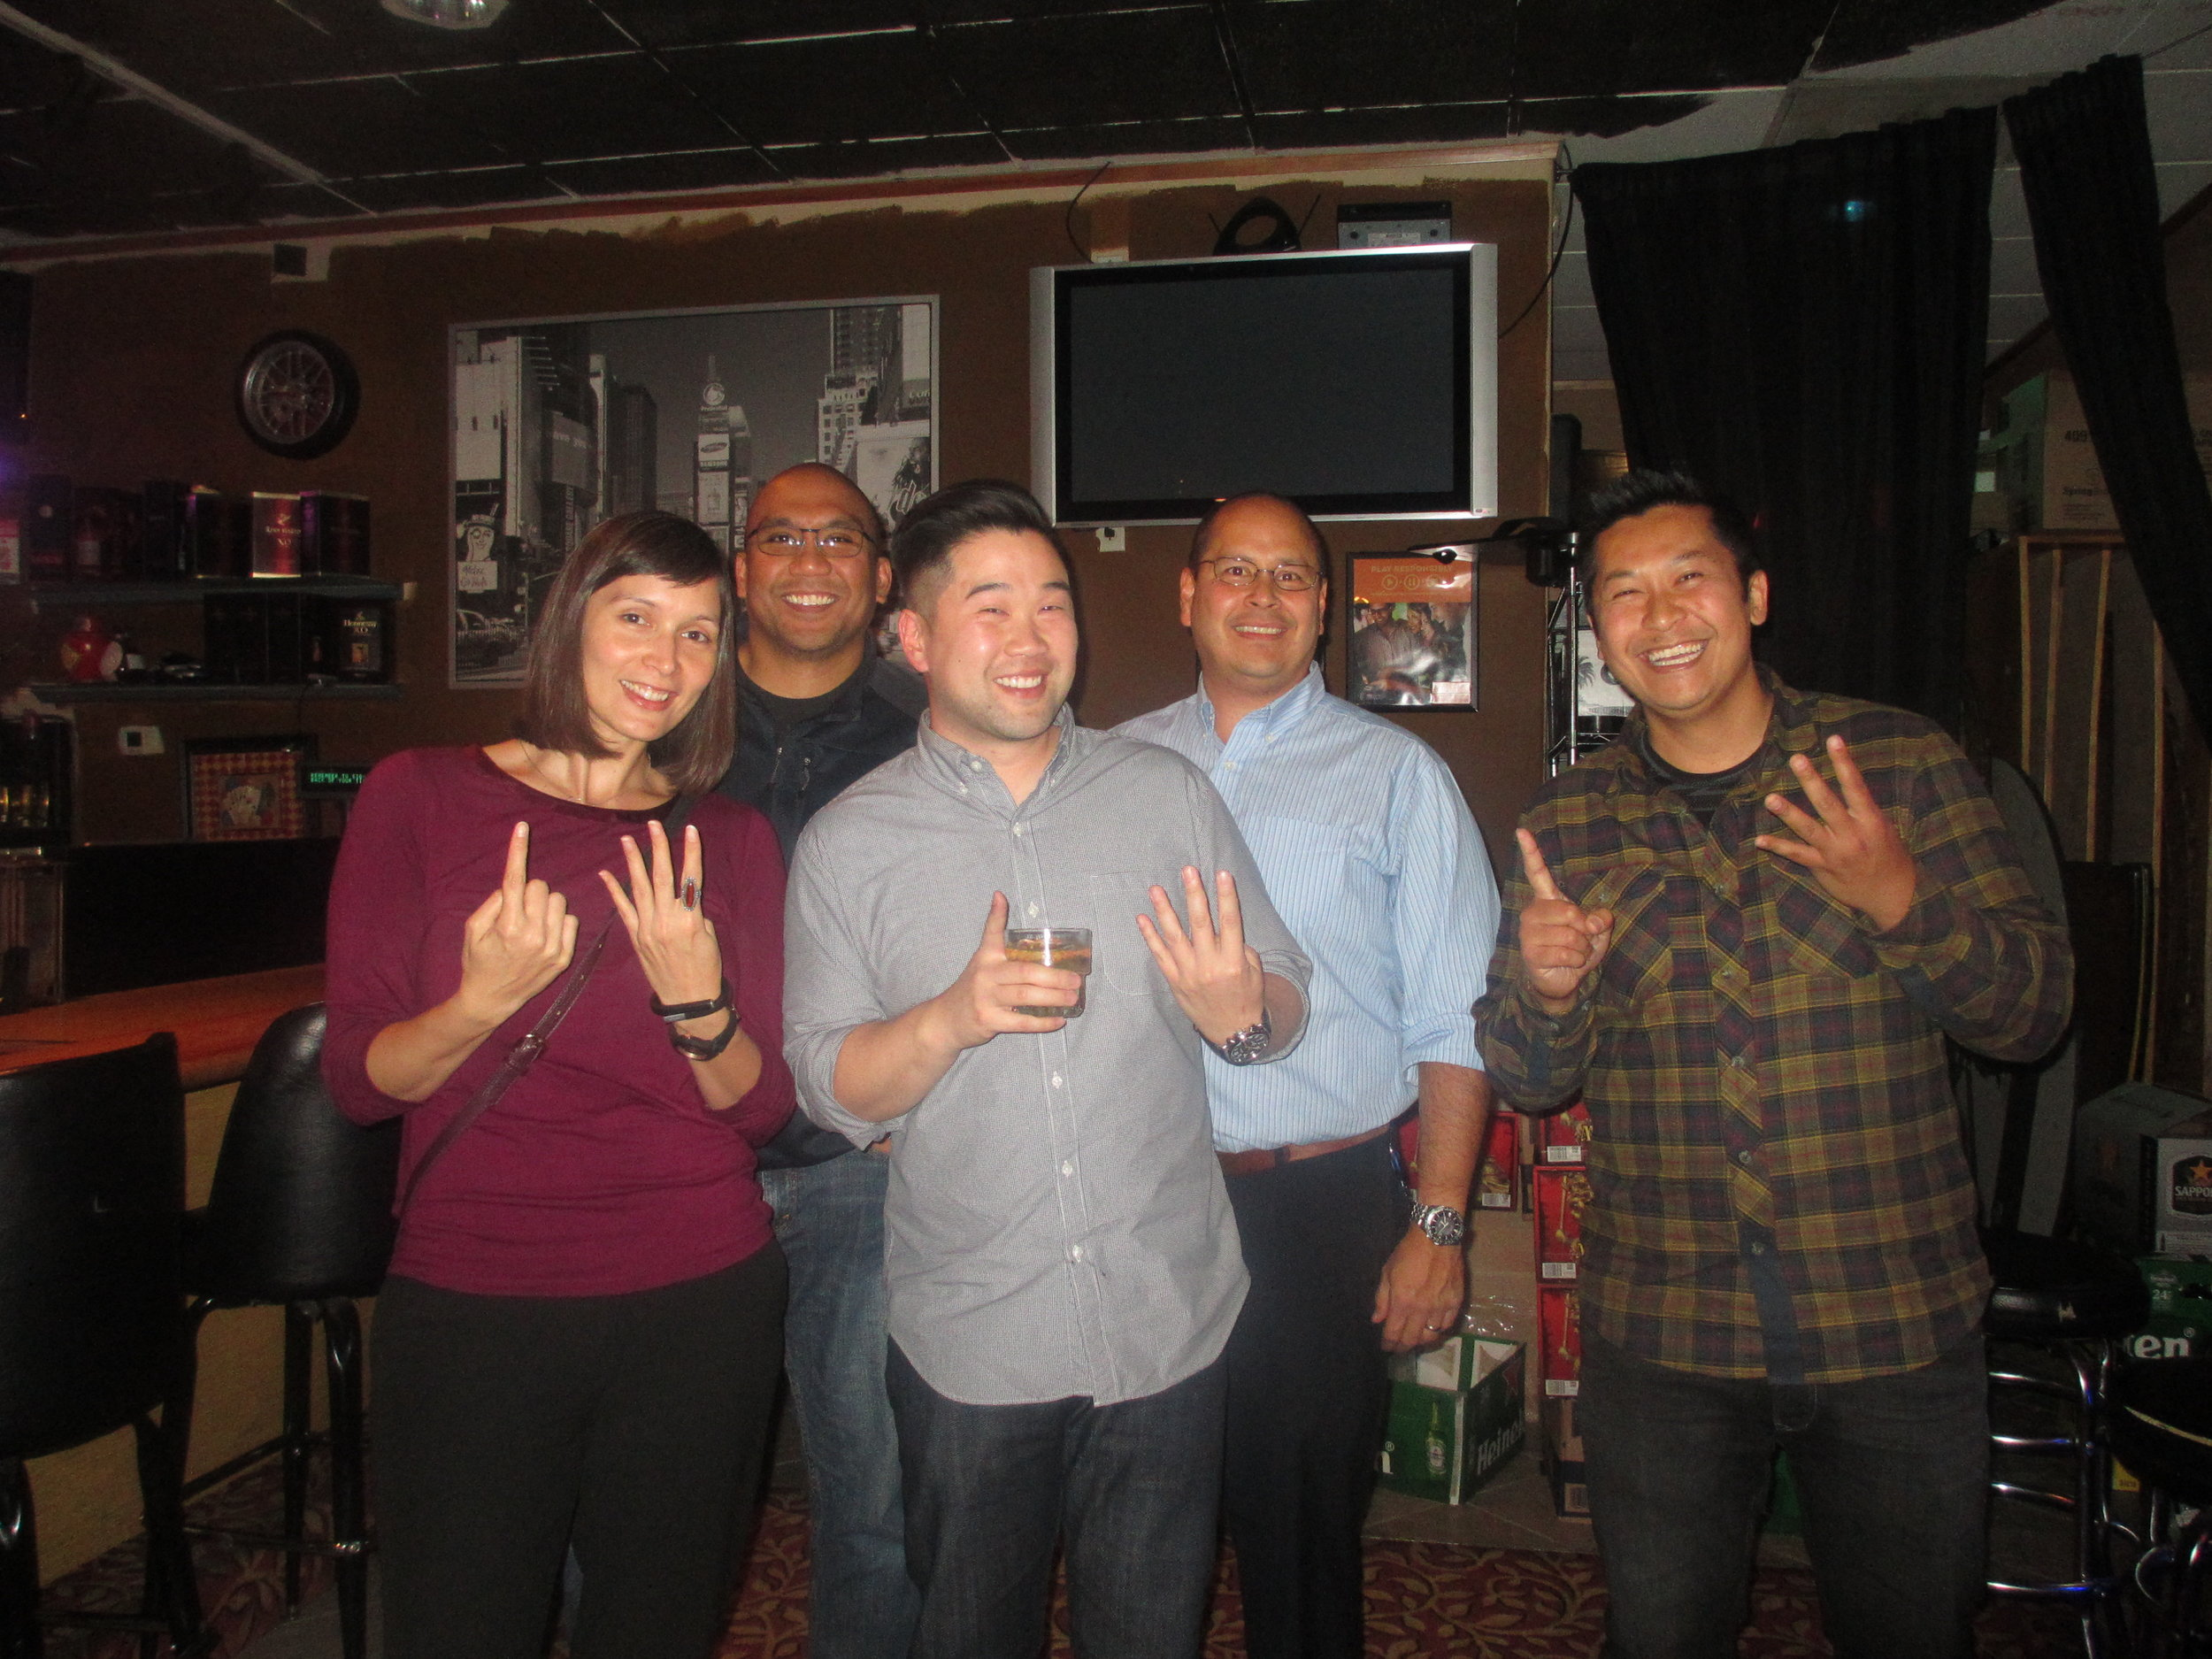 Class of 2014   Front: Jayna Dellatan, Simon Seid, Ken Lanehome   Class of 2011   Back: Ronson Ramos, Ryan Truair